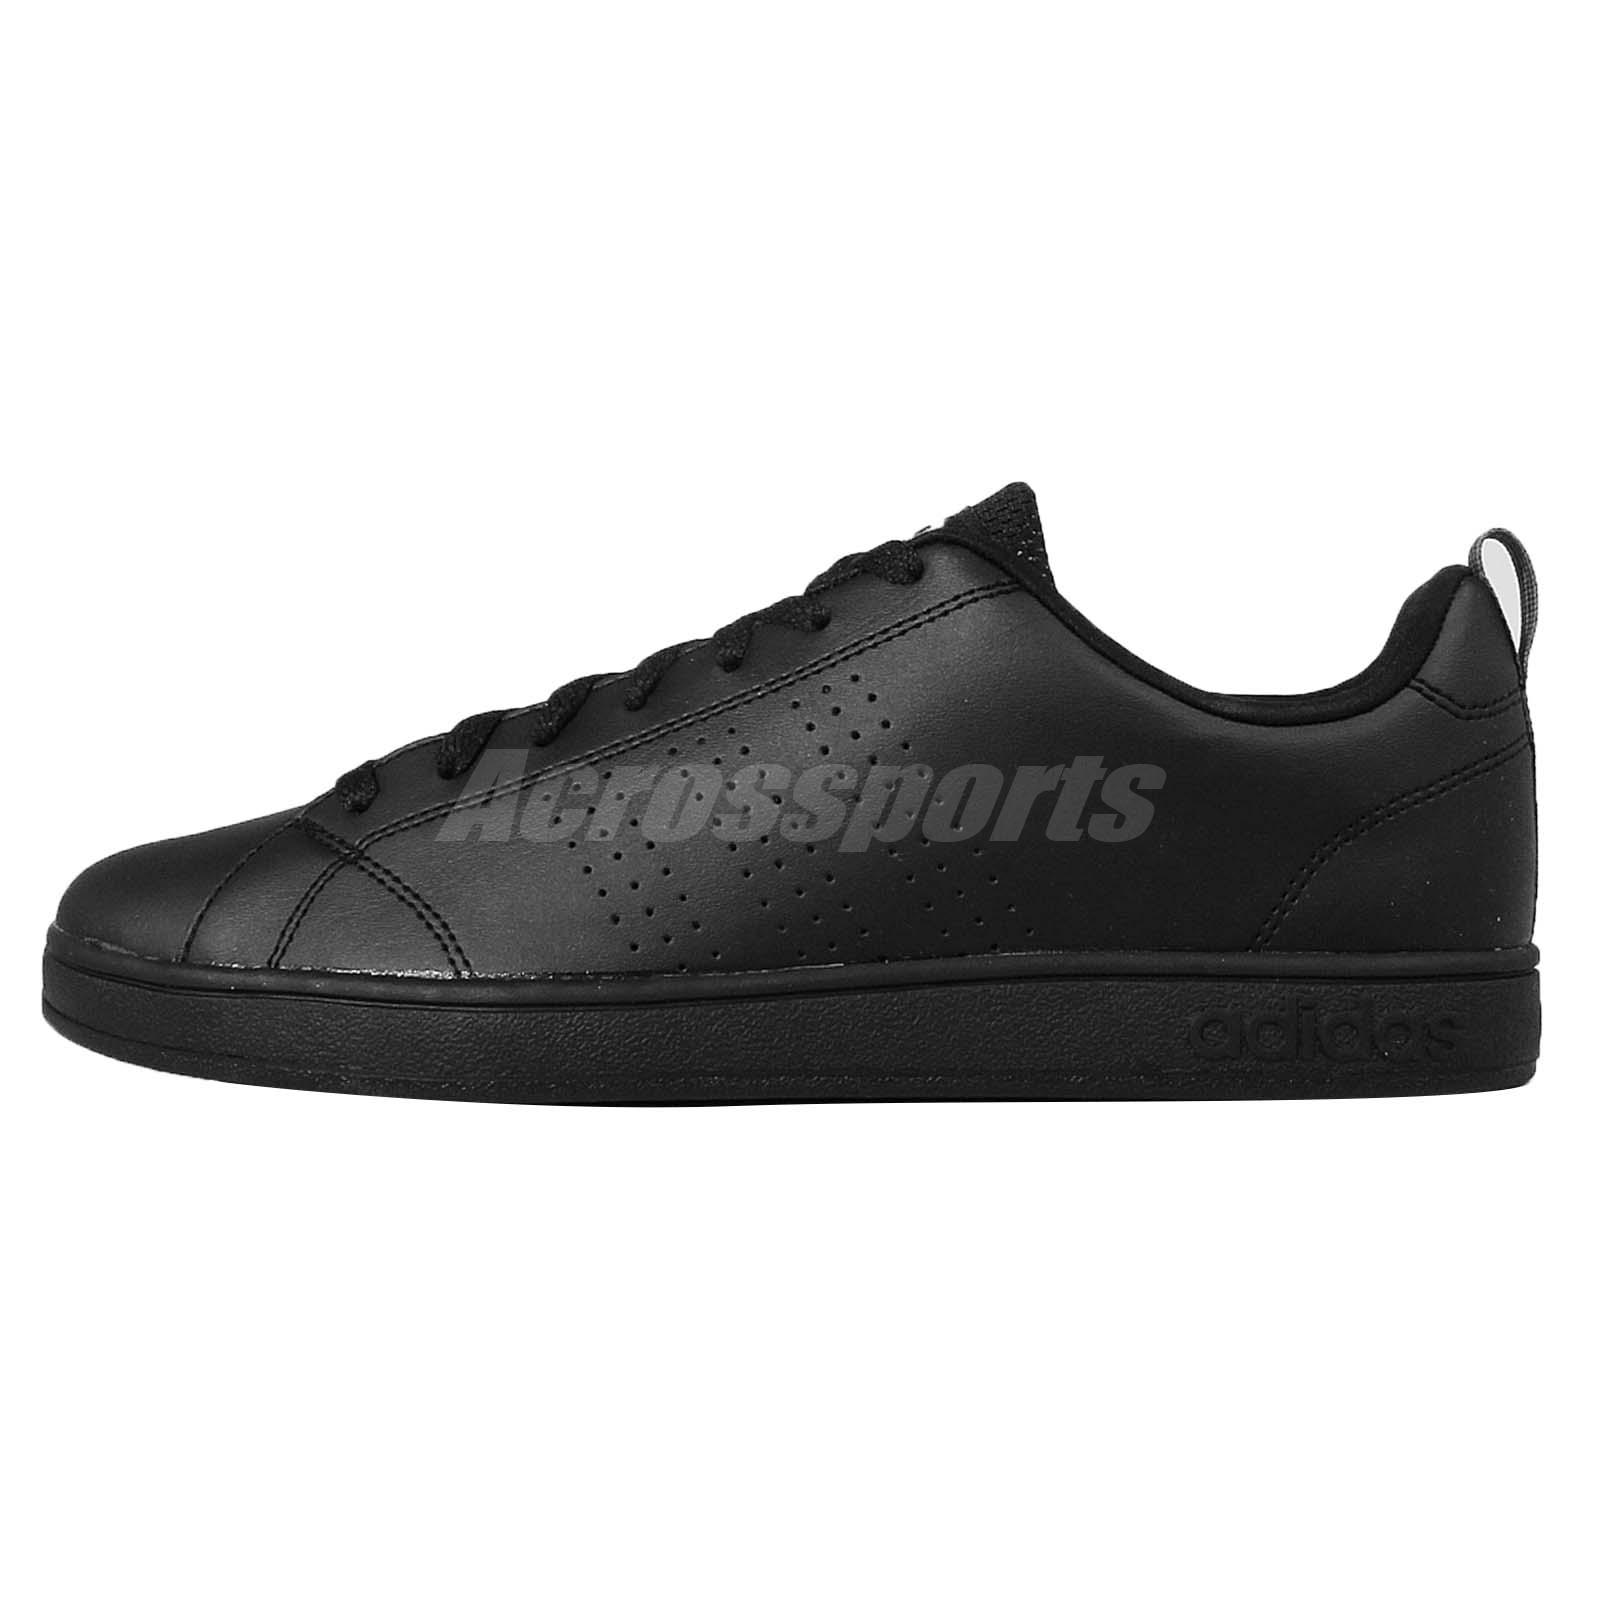 adidas neo label advantage vs clean mens fashion shoes. Black Bedroom Furniture Sets. Home Design Ideas